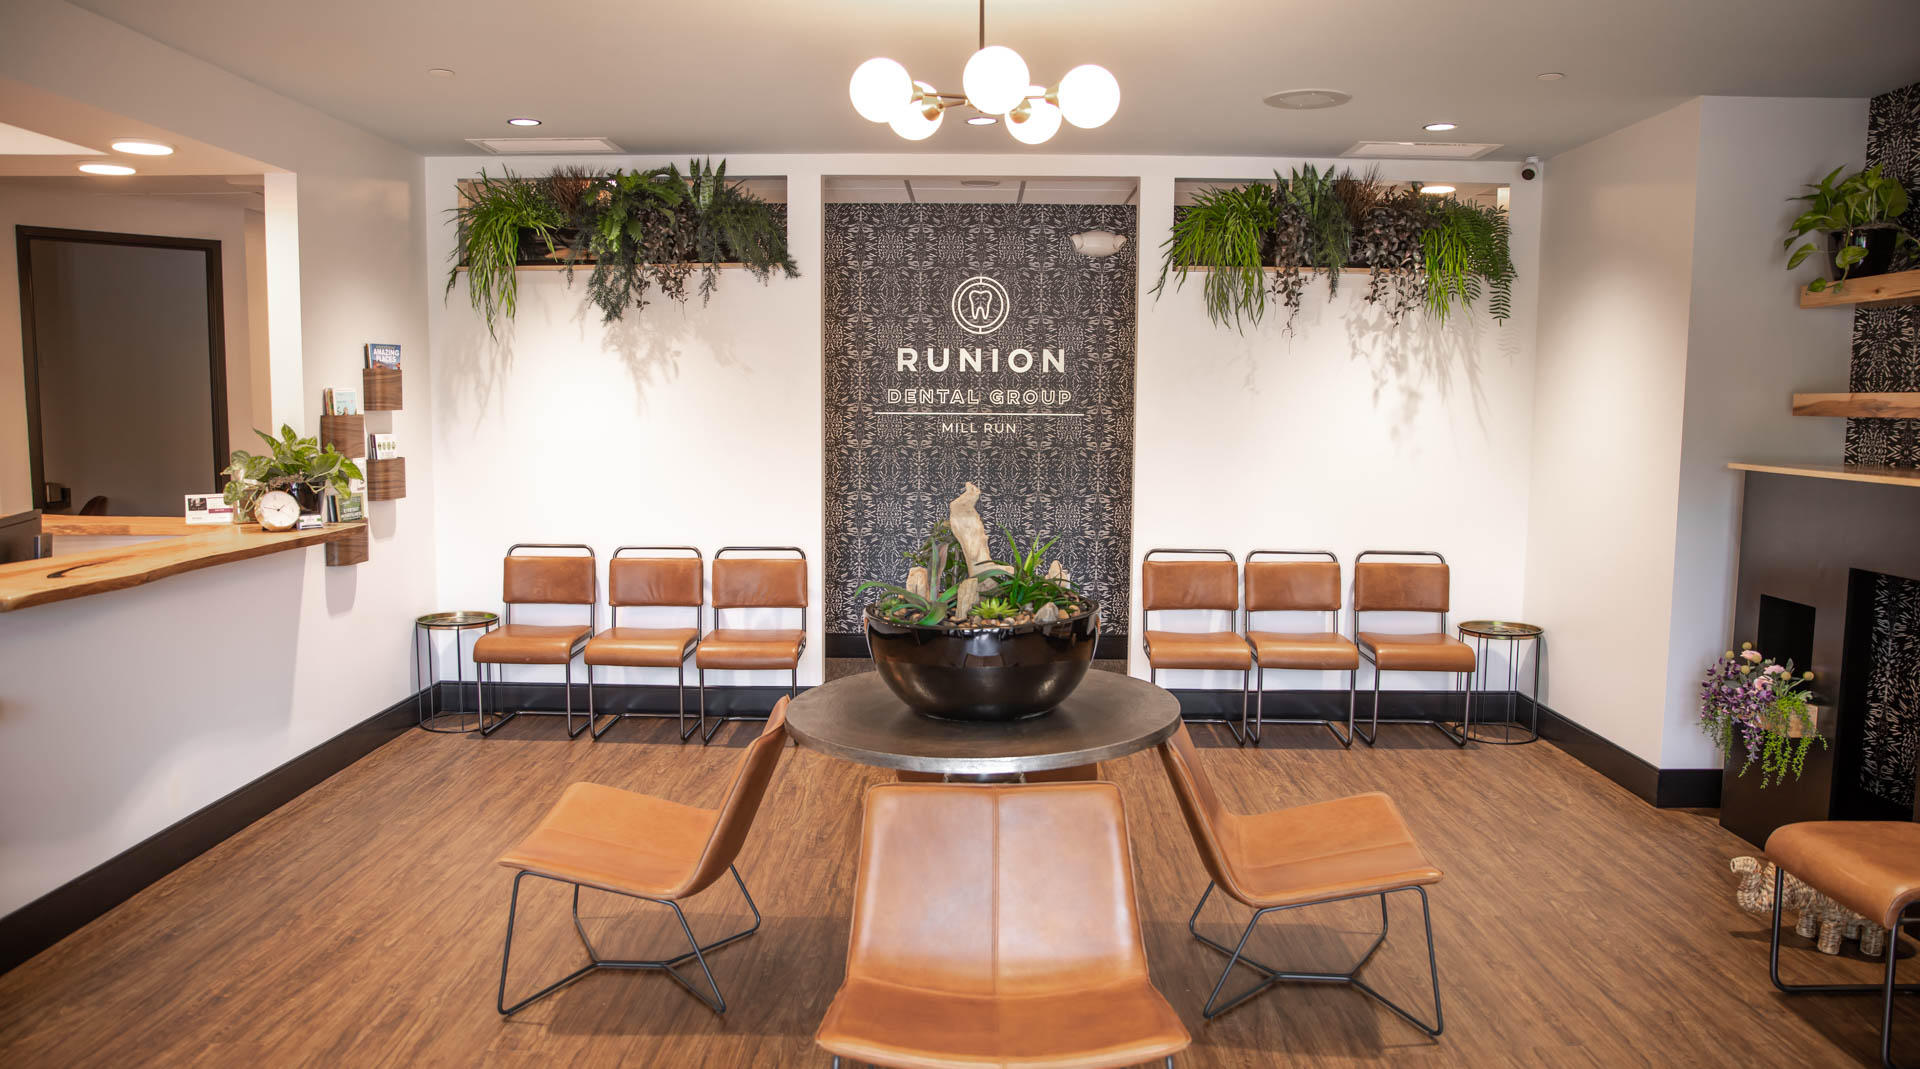 Runion Dental Group - Mill Run image 1